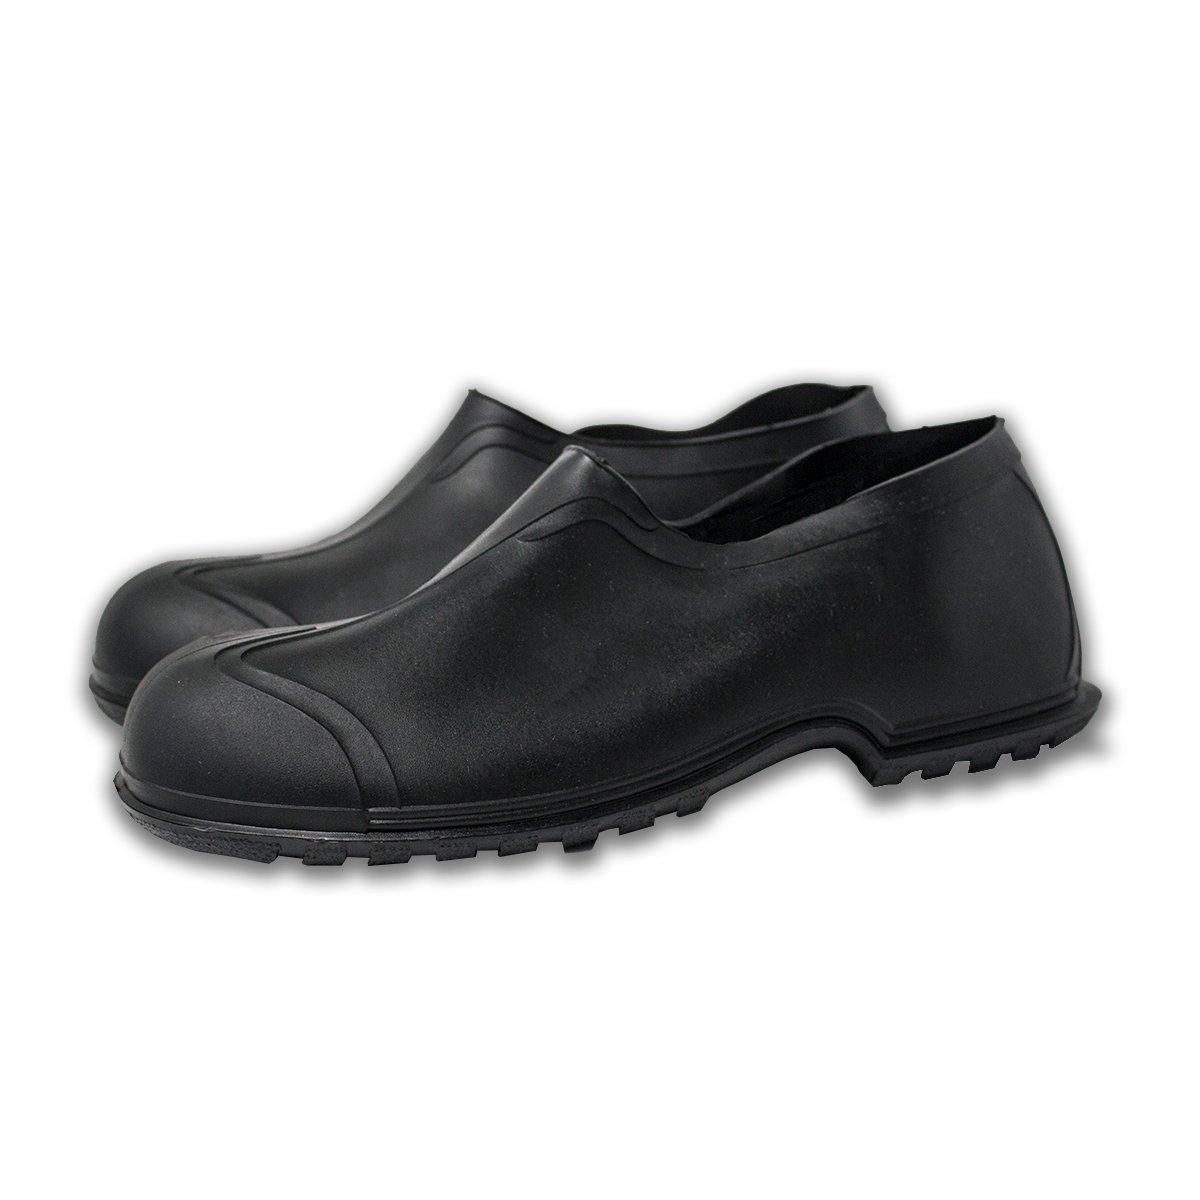 UltraSource 440095-XL PVC Overshoes, 4'', Black, Size X-Large (12-13)